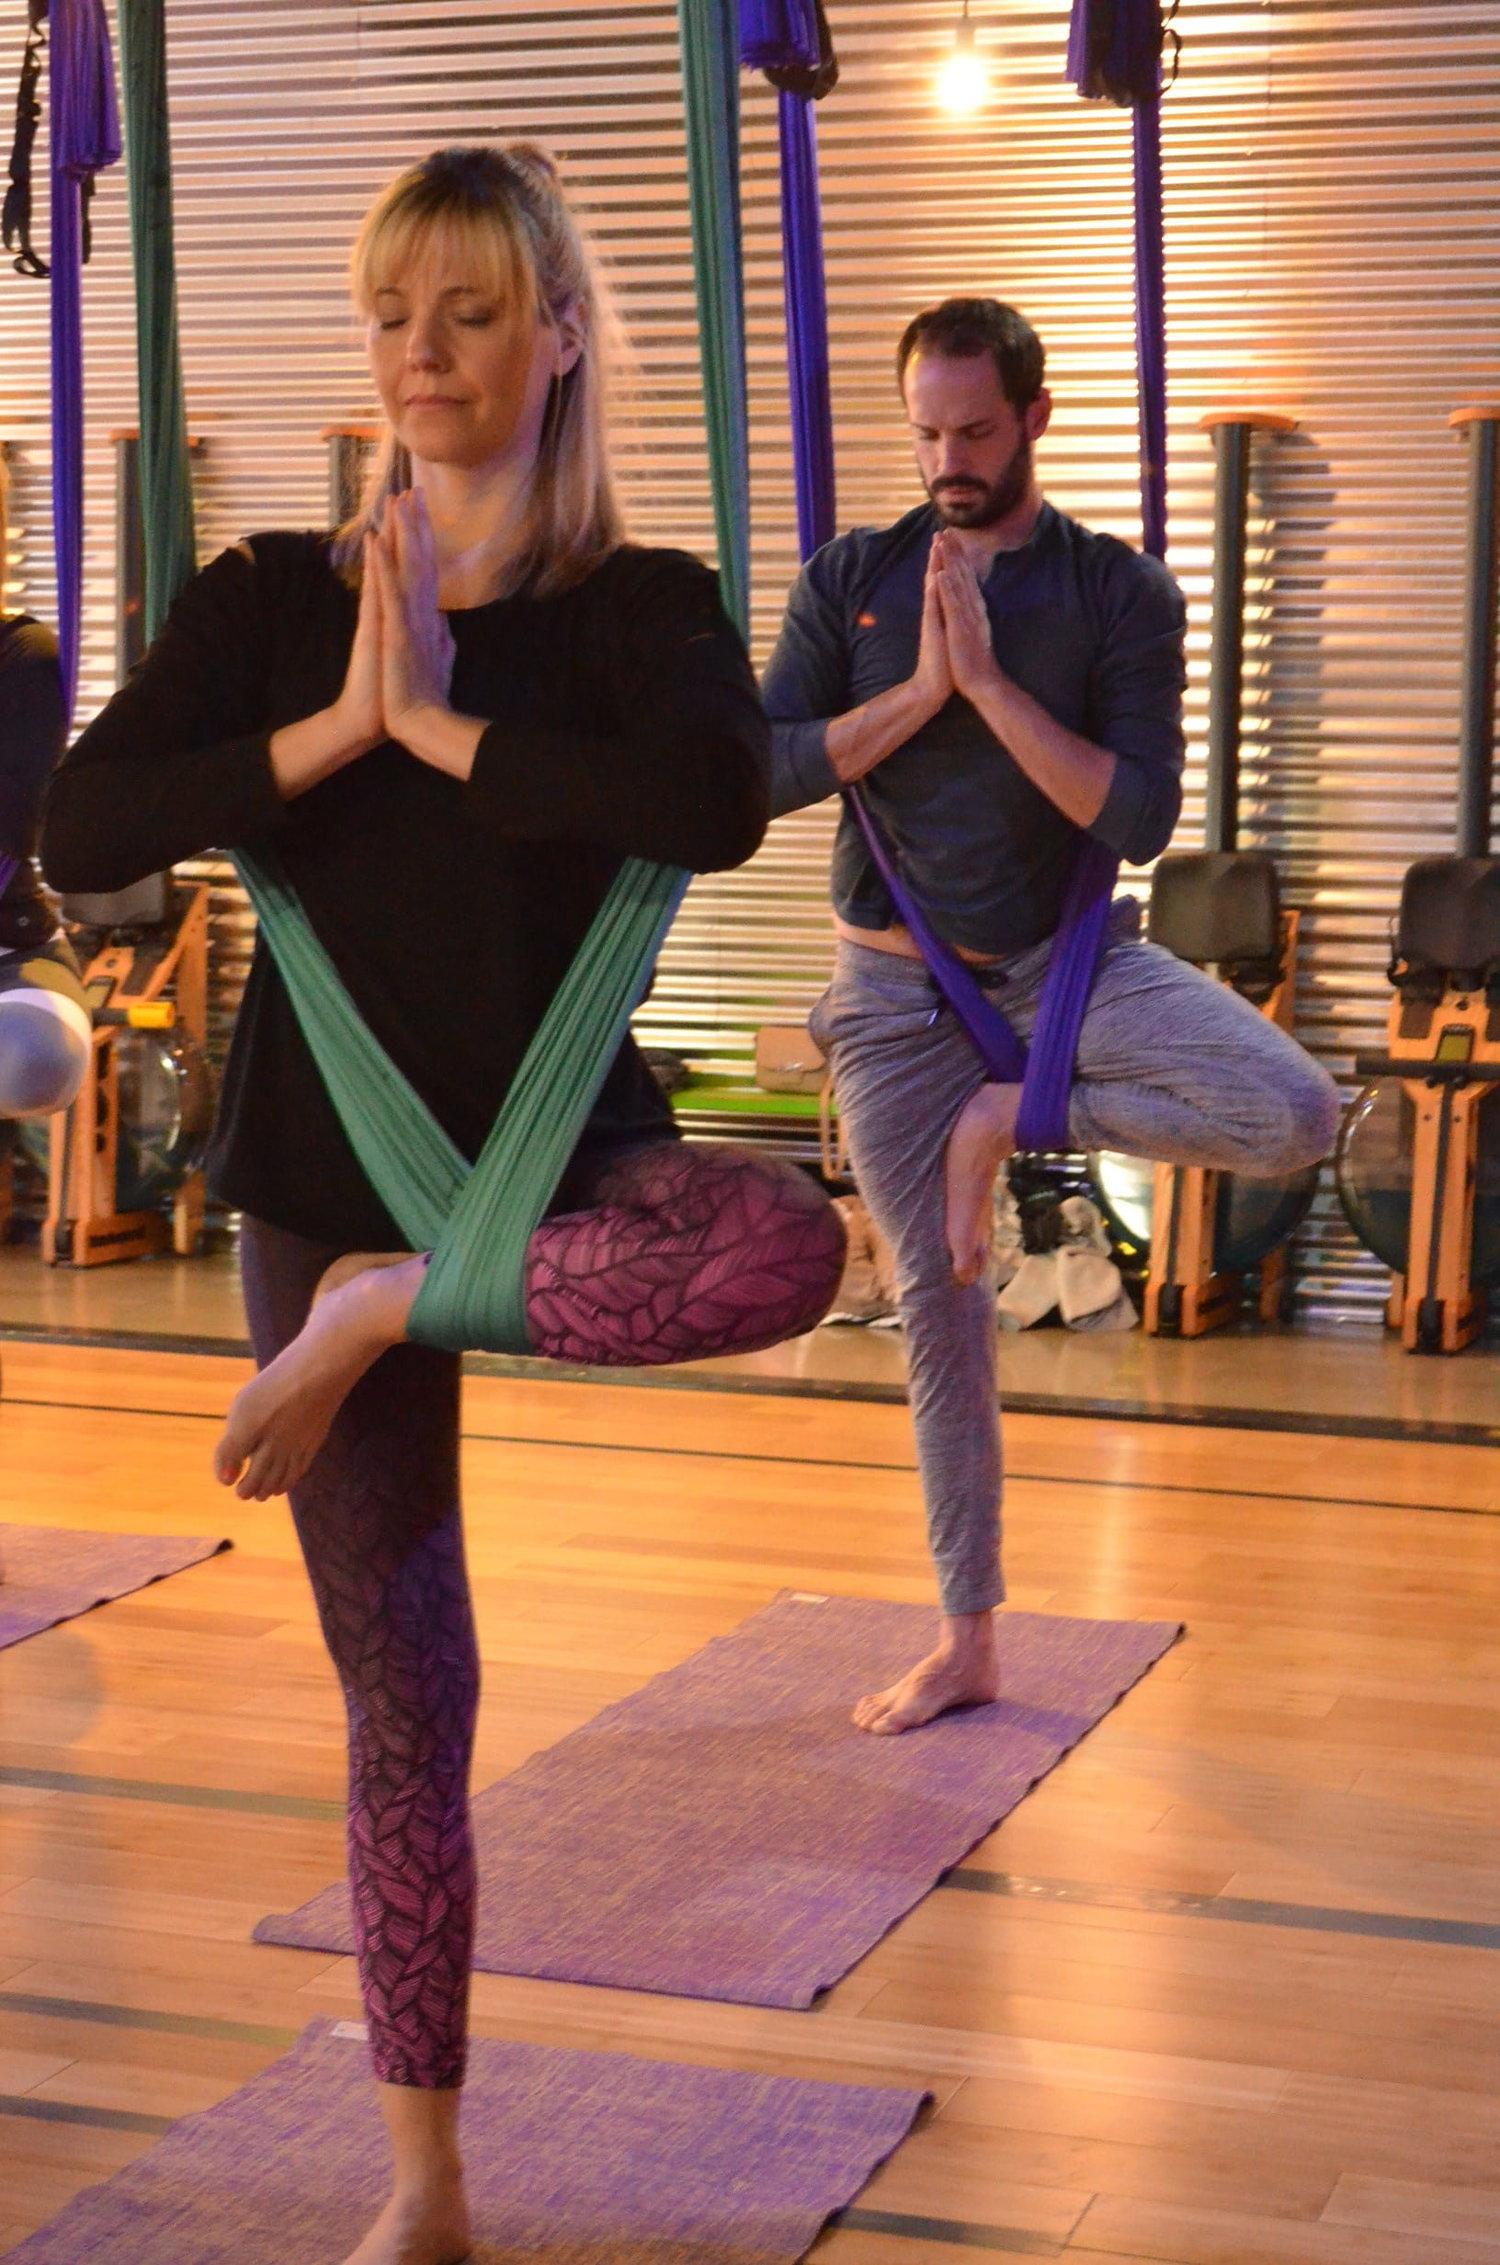 Swet Studio Aerial Yoga Rowing Fitness Studio Boston Ma